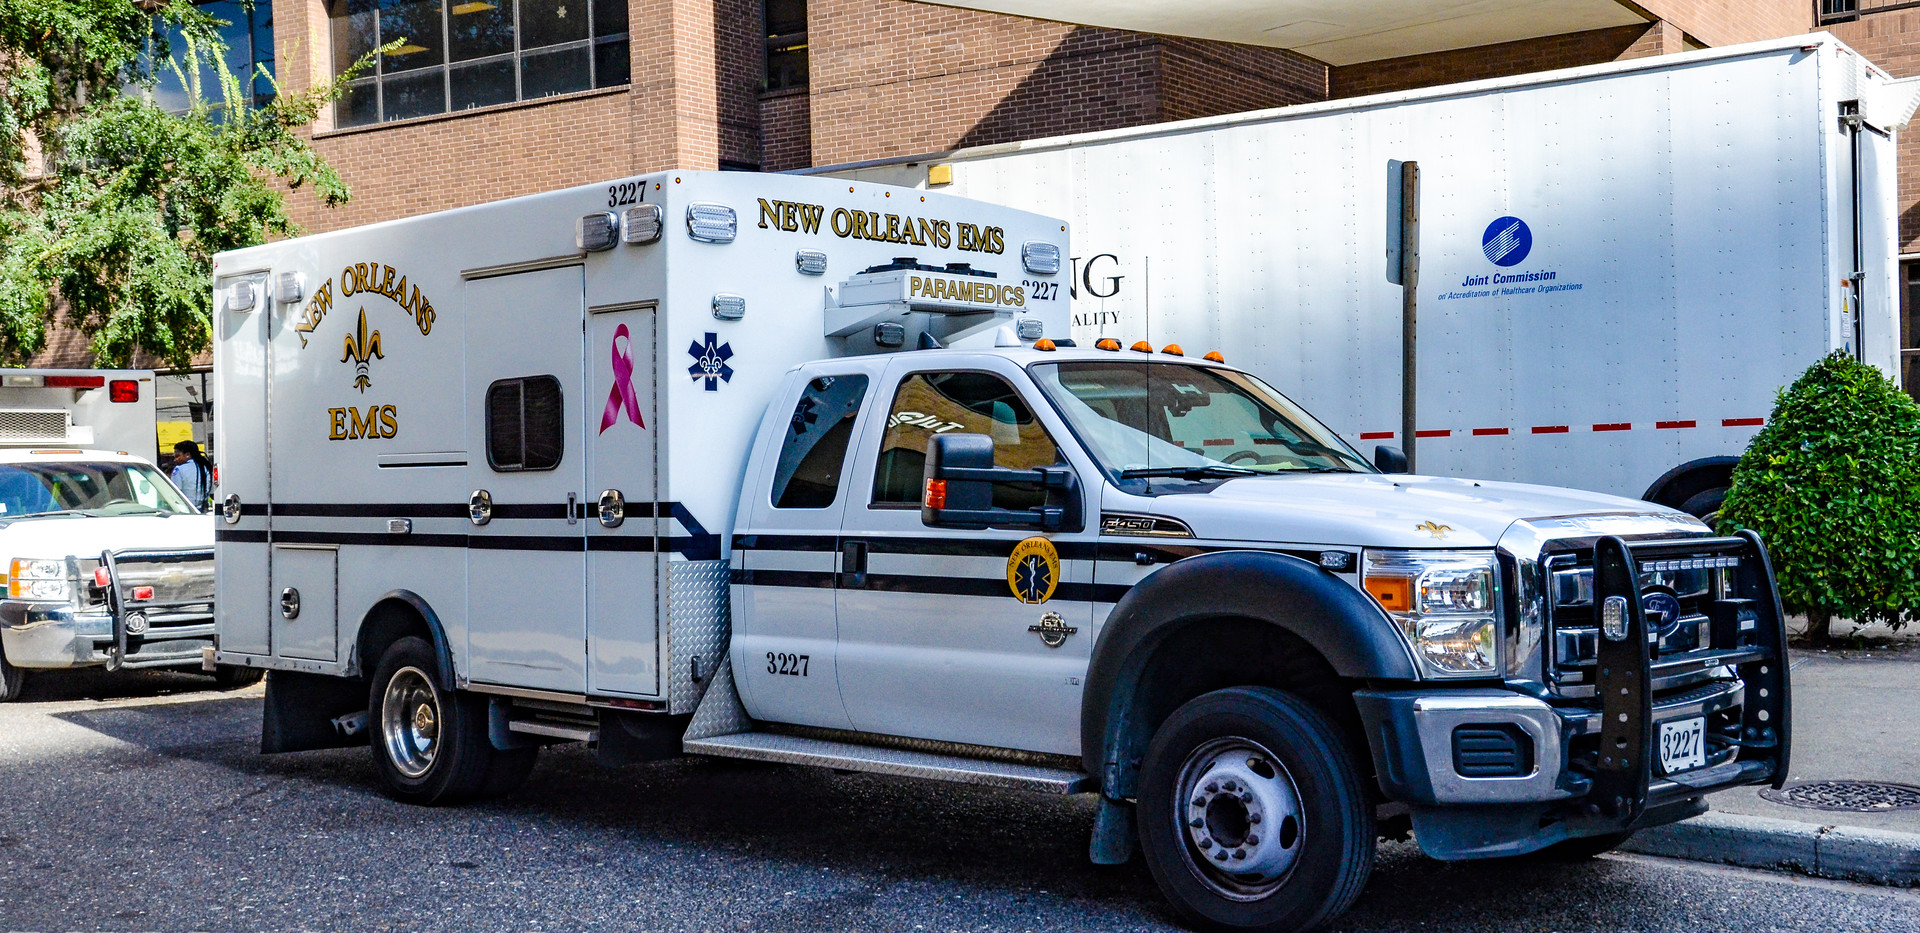 NEW ORLEANS EMS 3227